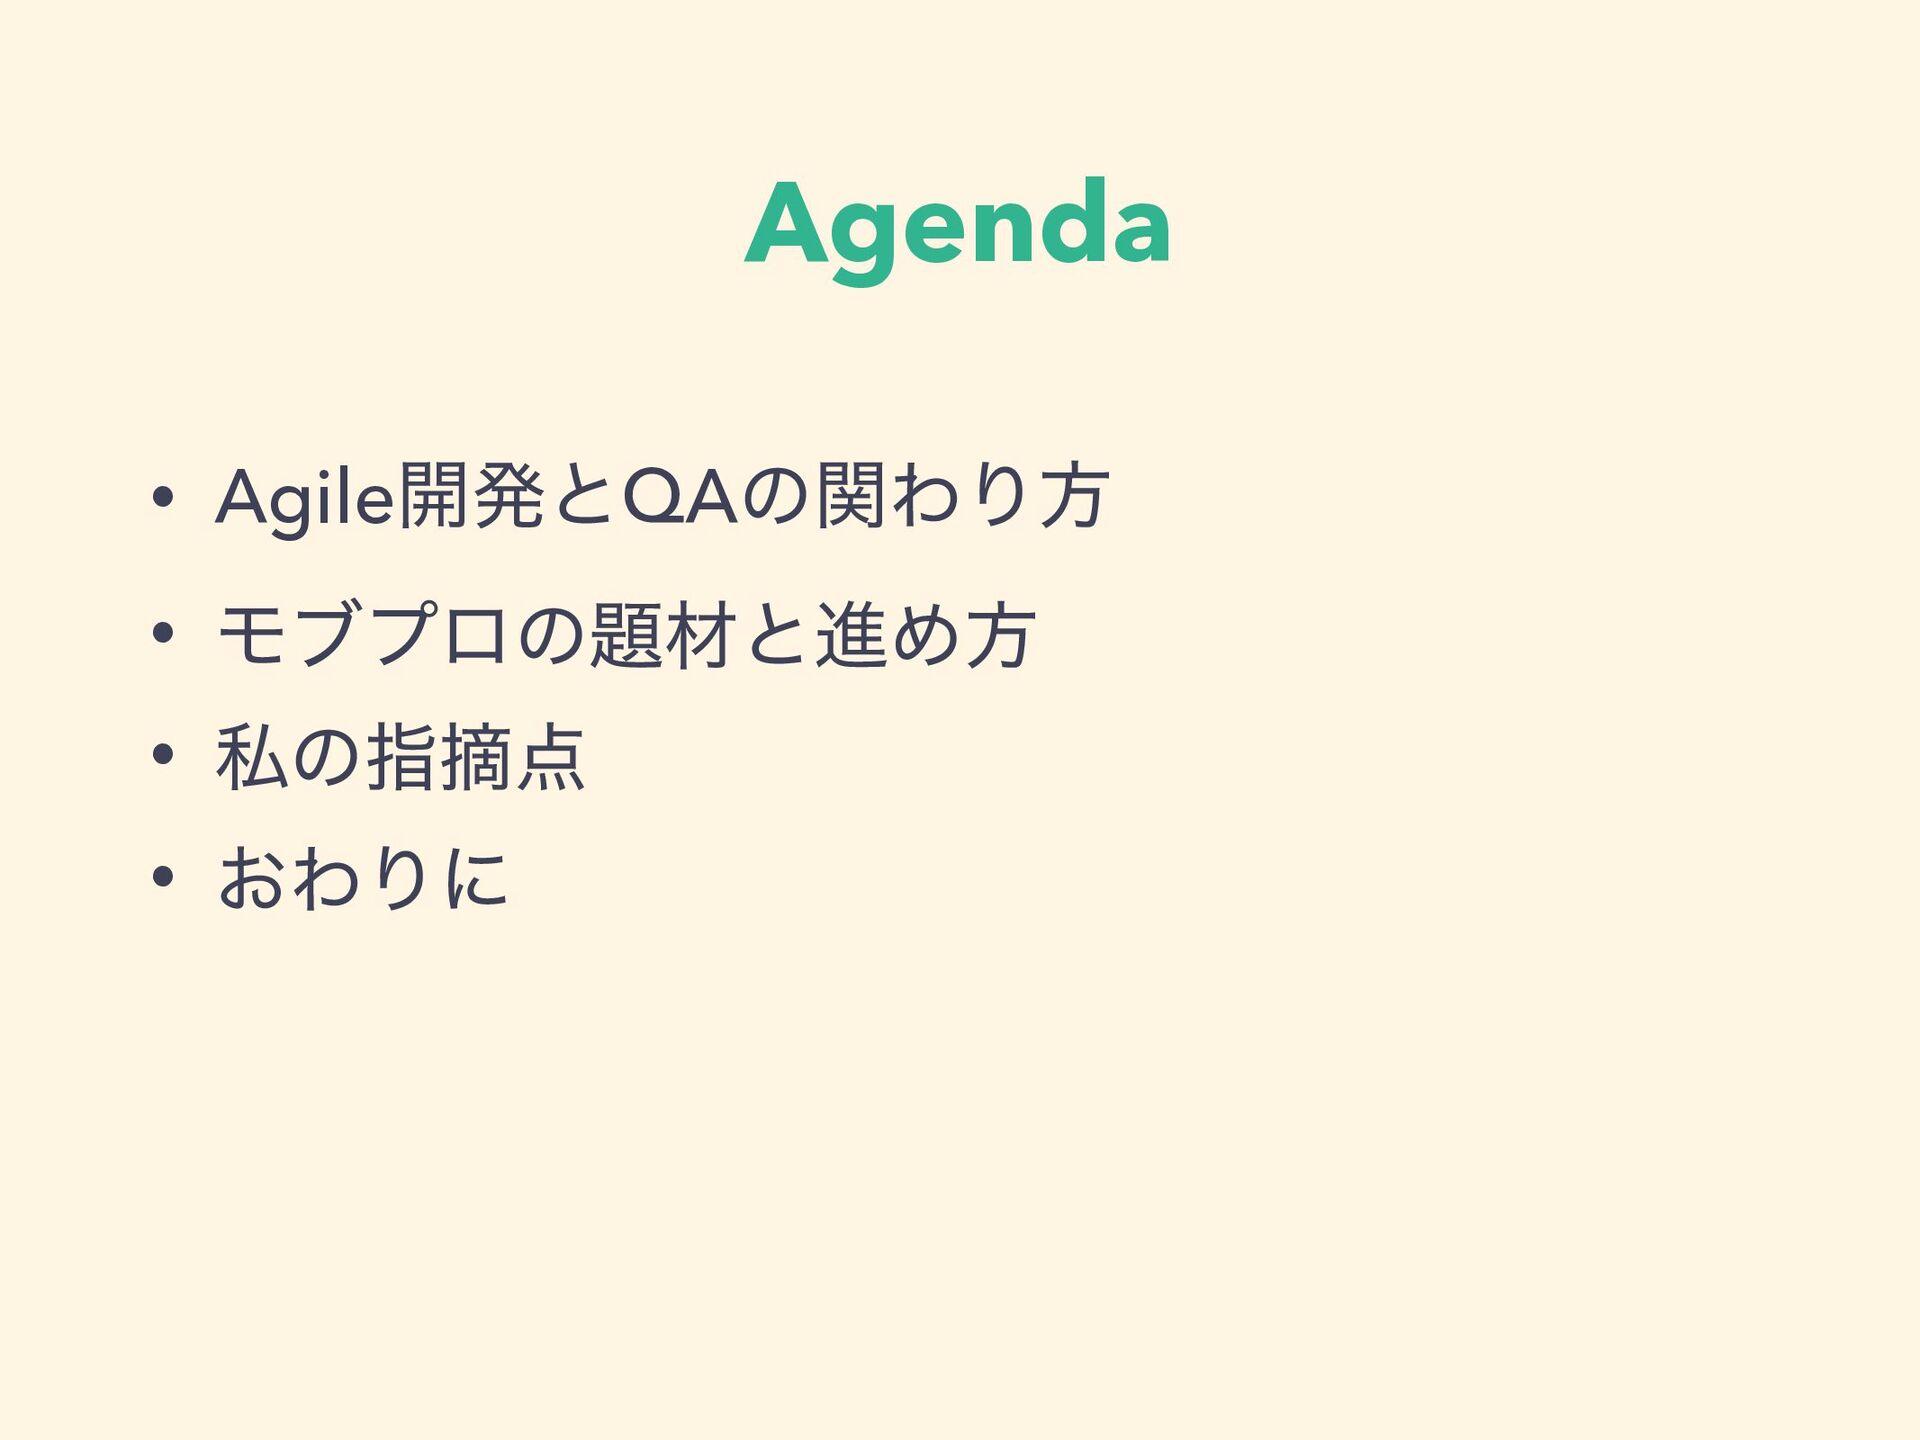 Agenda • Agile։ൃͱQAͷؔΘΓํ • ϞϒϓϩͷࡐͱਐΊํ • ࢲͷࢦఠ ...